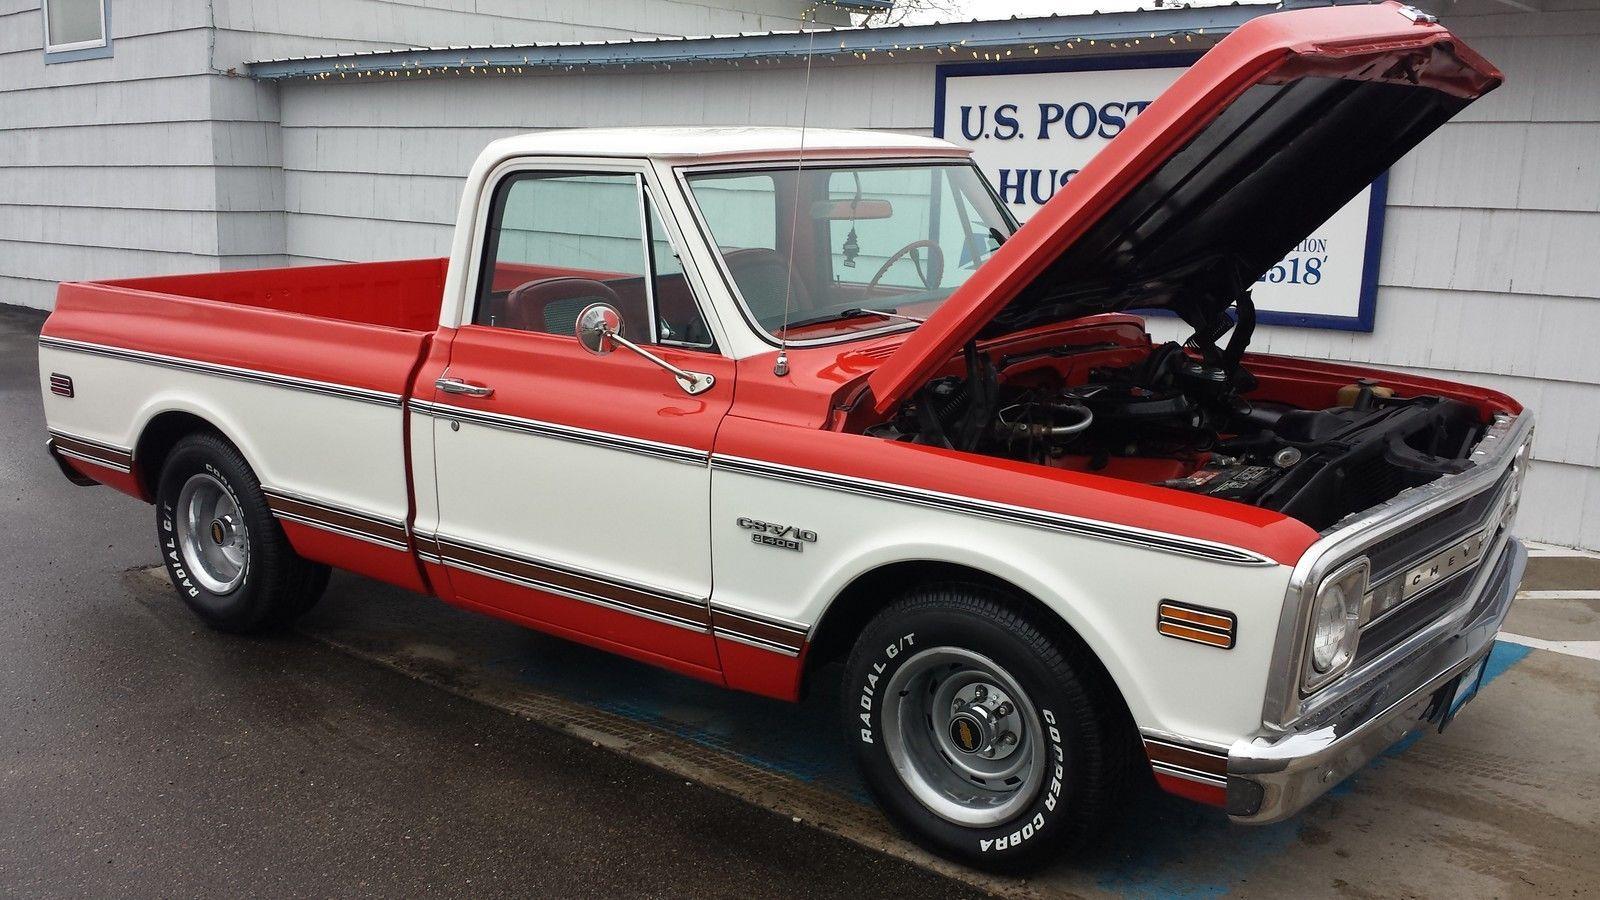 1970 Chevy Cst 10 396 Short Box Chevrolet 70 67 72 Pickup Gmc 1971 1969 1972 Chevy Trucks Chevy 72 Chevy Truck